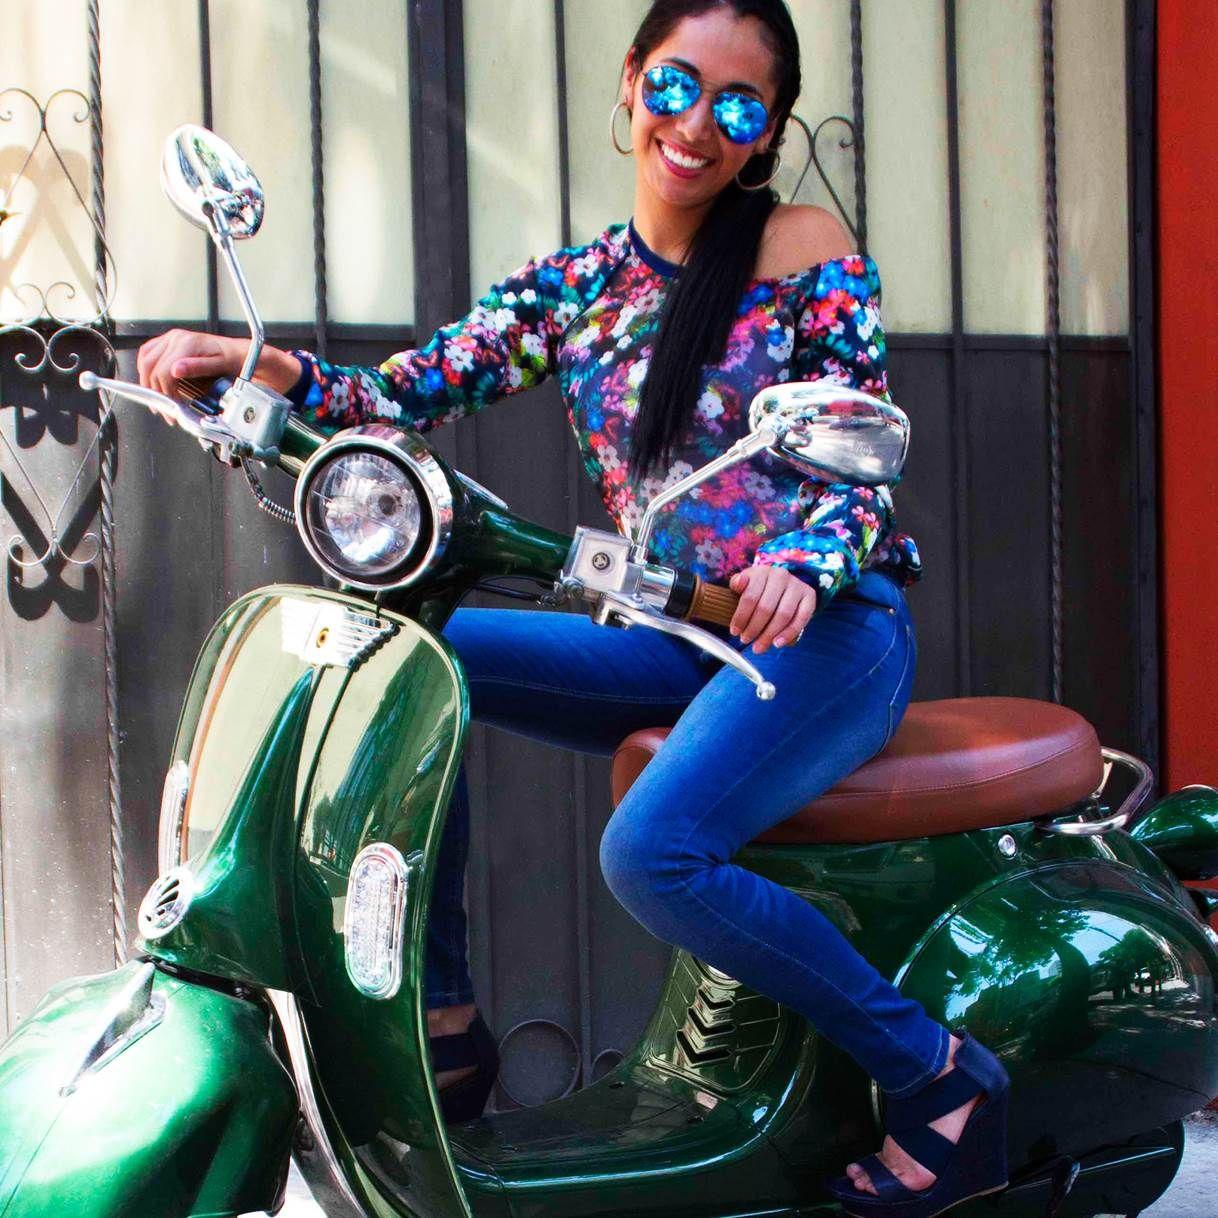 Buscamos inspiración por las calles de la ciudad, andamos de fashion tour ♡ #ILOVEPS #bike #style #FloralPrint #jeans #aoutfit #girl  Visítanos en → http://tiendaenlinea.priceshoes.com/